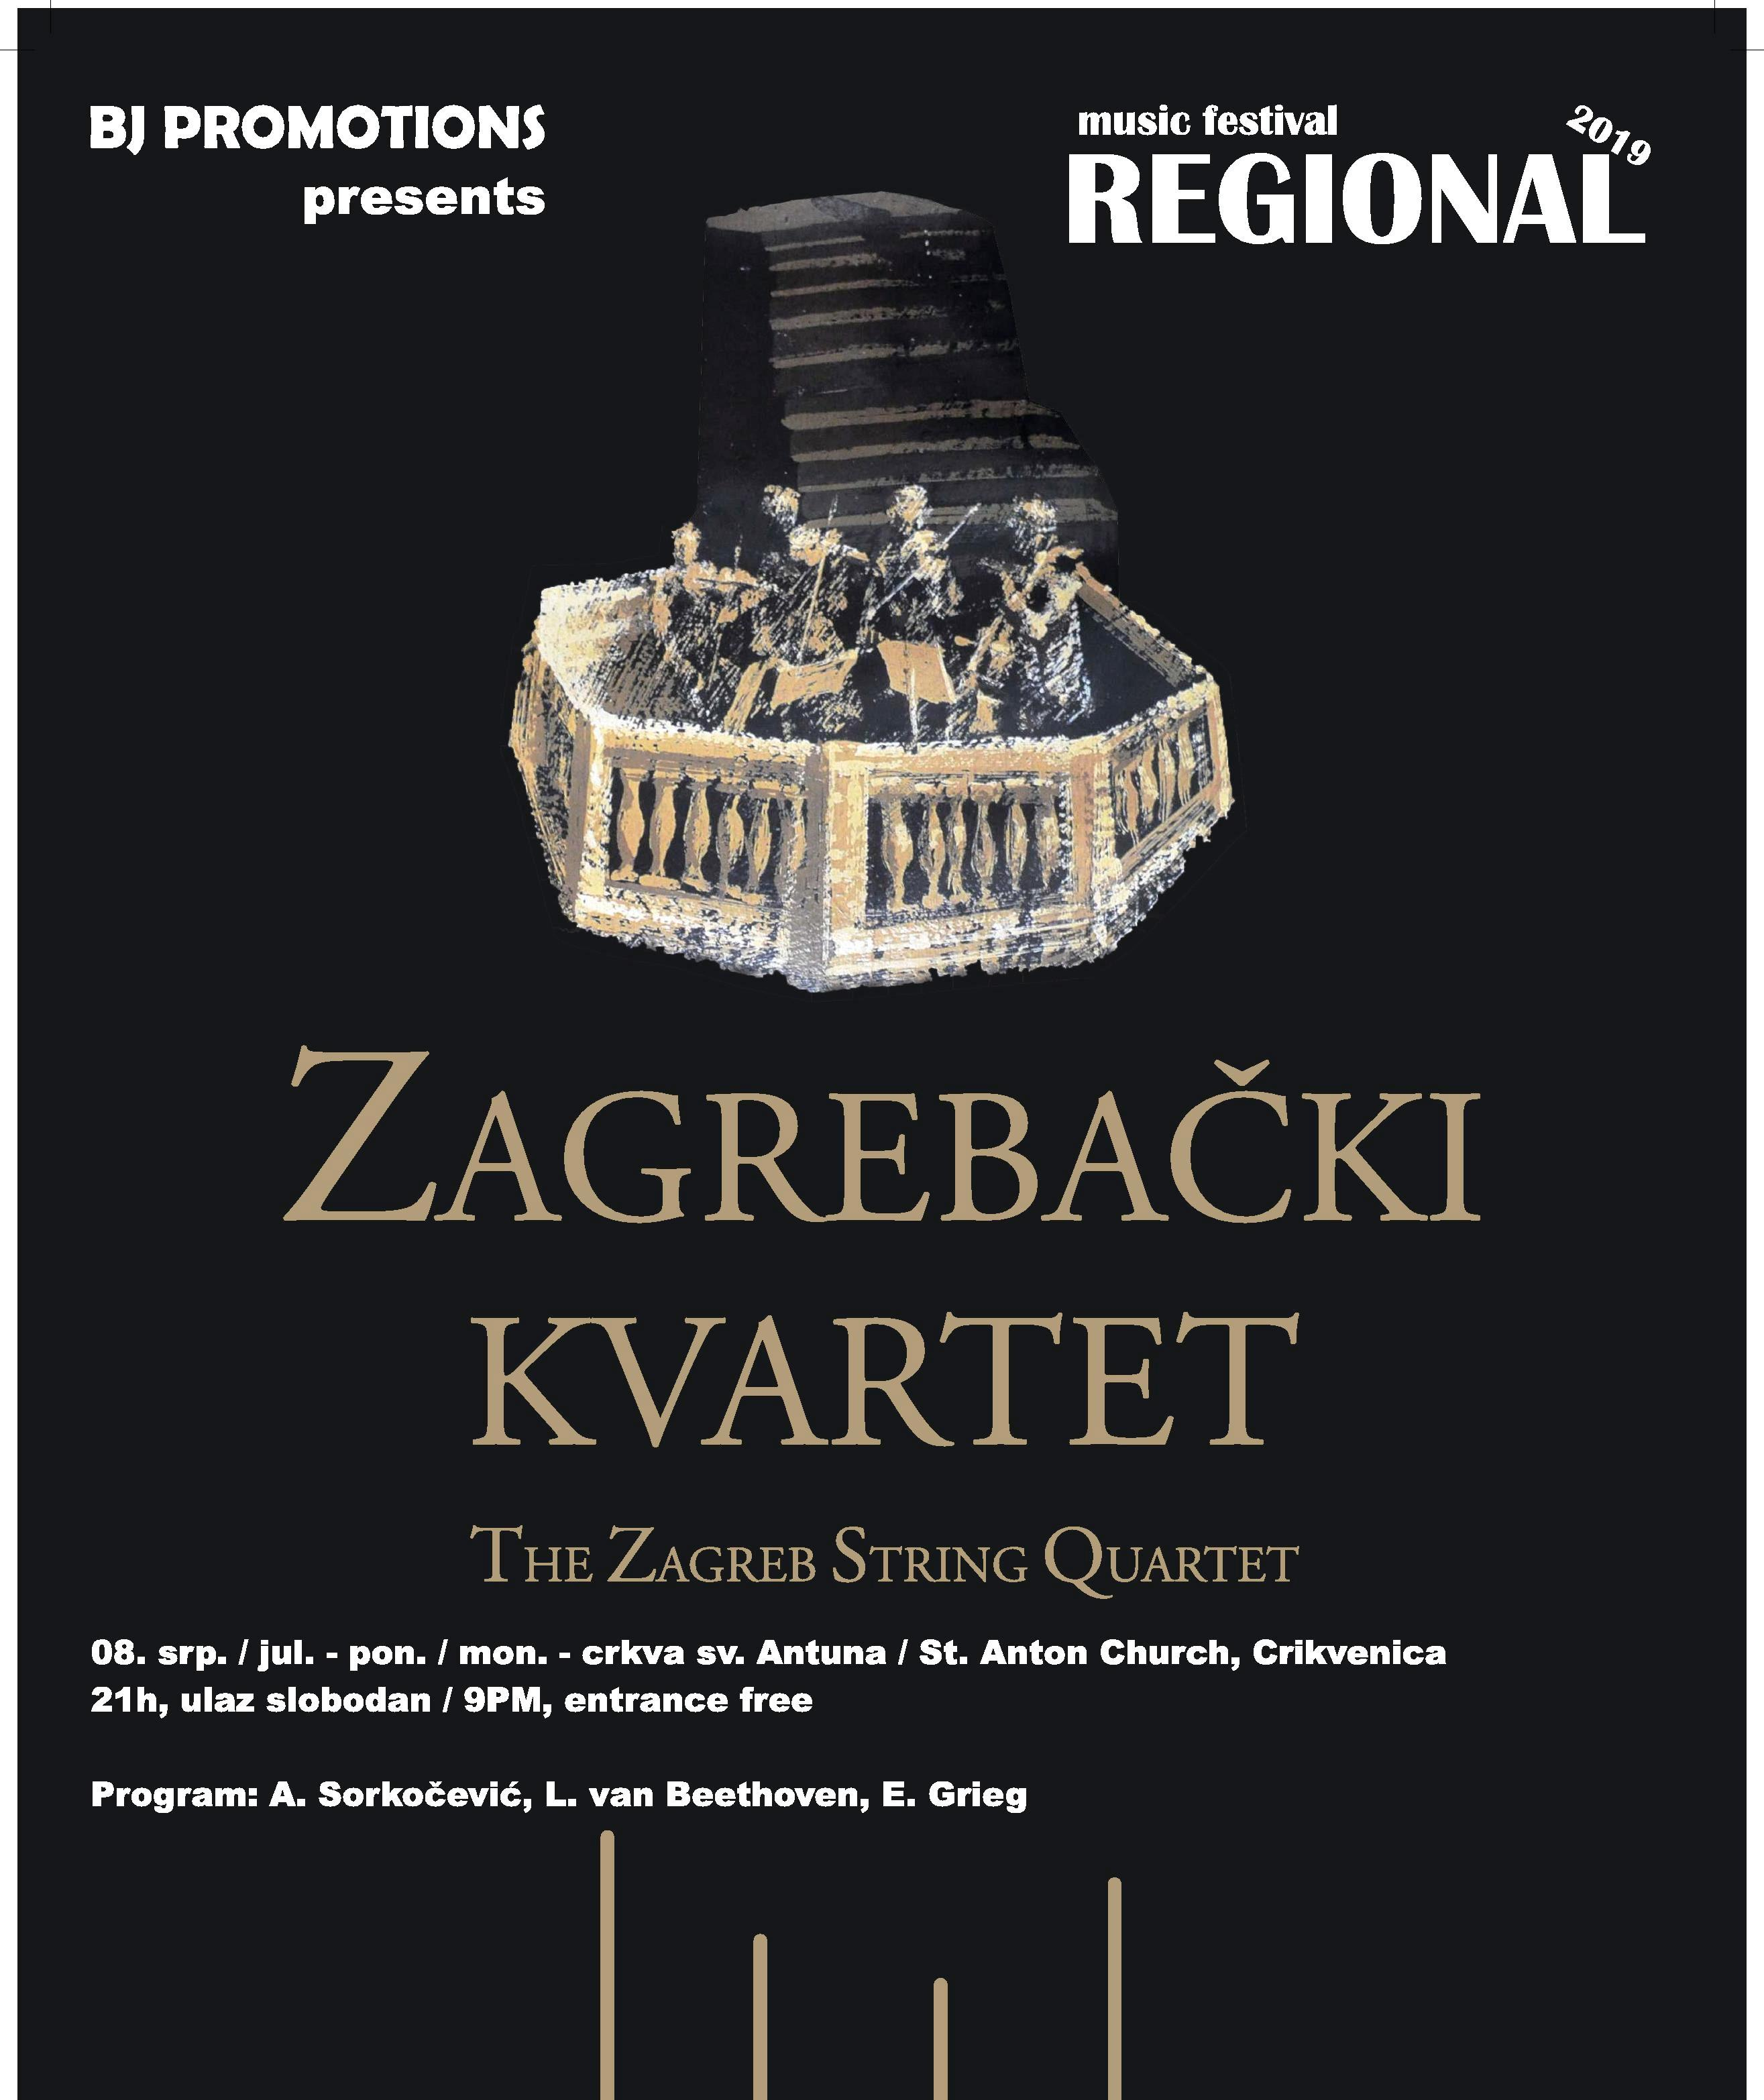 _Zagrebački kvartet - Crikva 2019_A2-v2 (1)_compressed (1)-page-001 - Copy